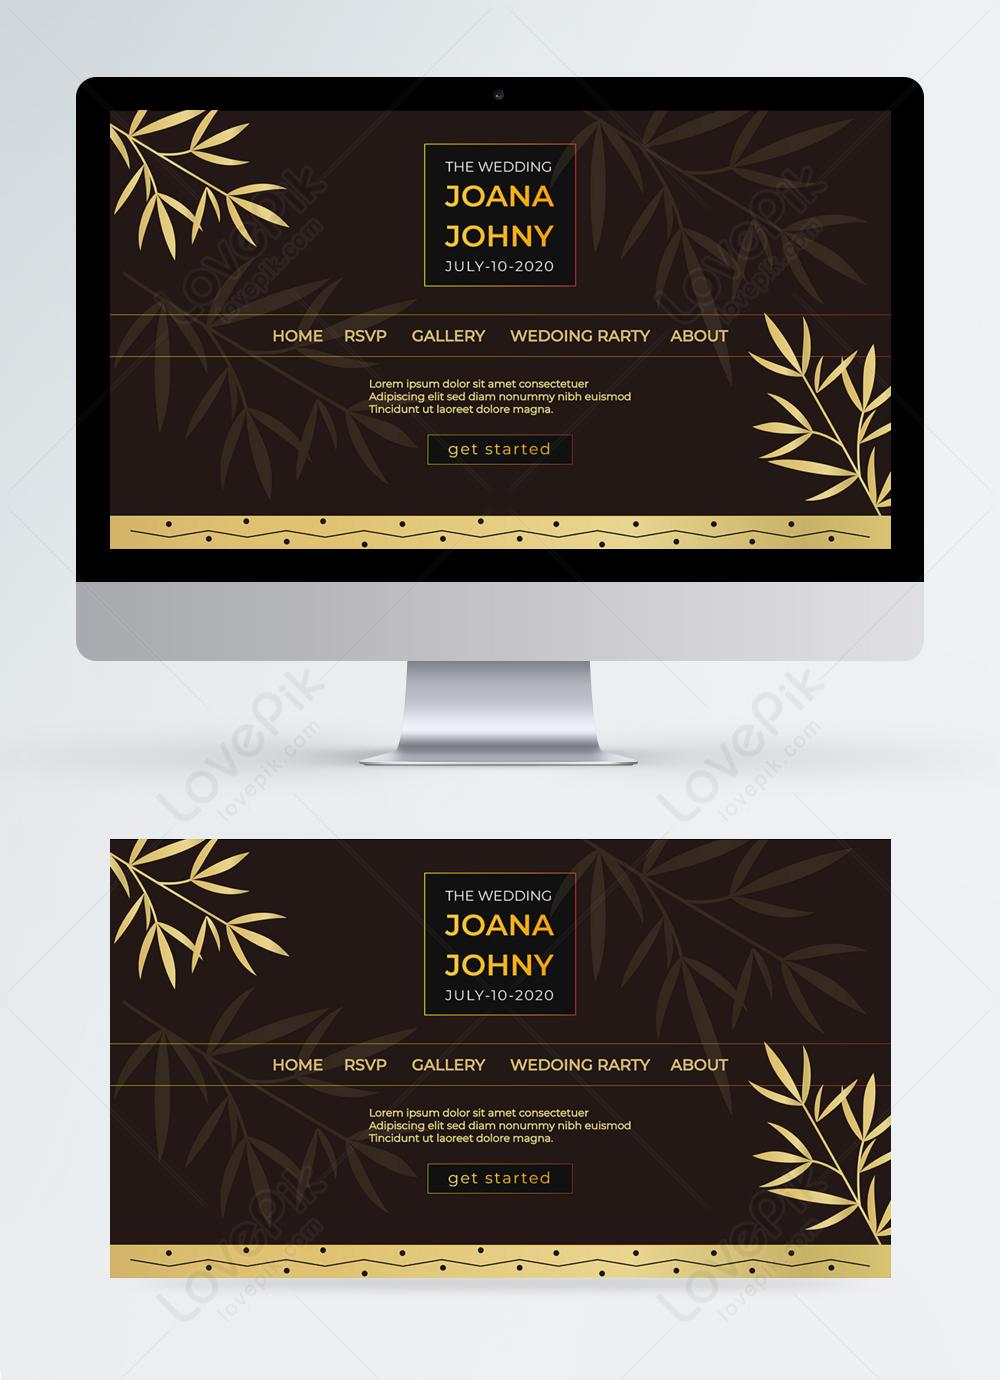 Simple Black Gold Rose Wedding Planning Web Design Template Image Picture Free Download 465444813 Lovepik Com